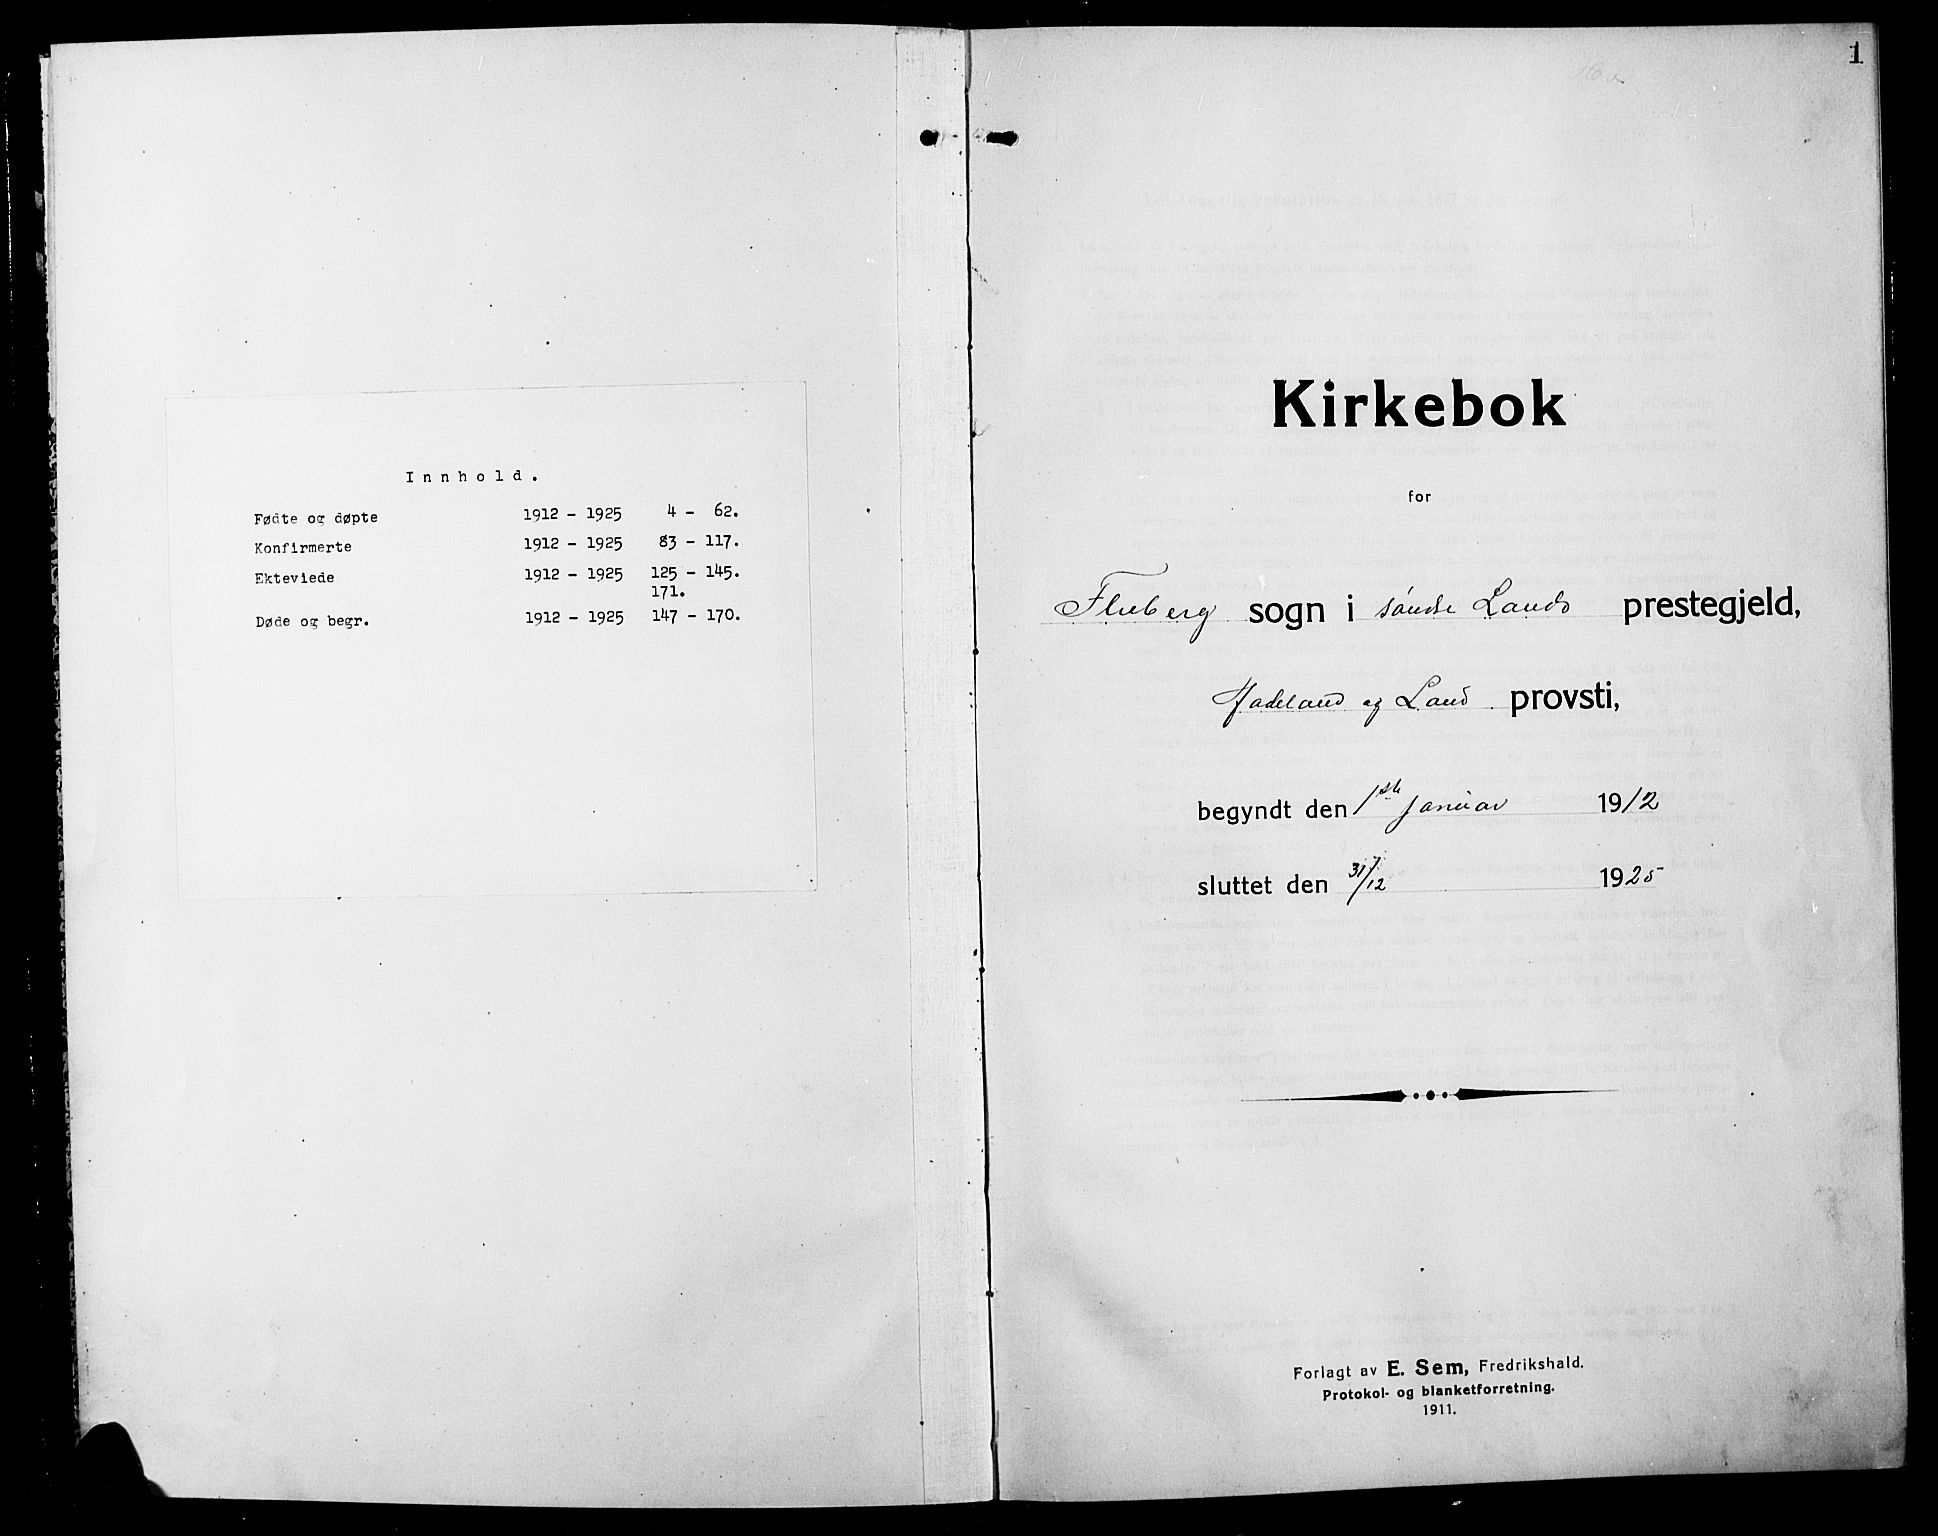 SAH, Søndre Land prestekontor, L/L0006: Klokkerbok nr. 6, 1912-1925, s. 1